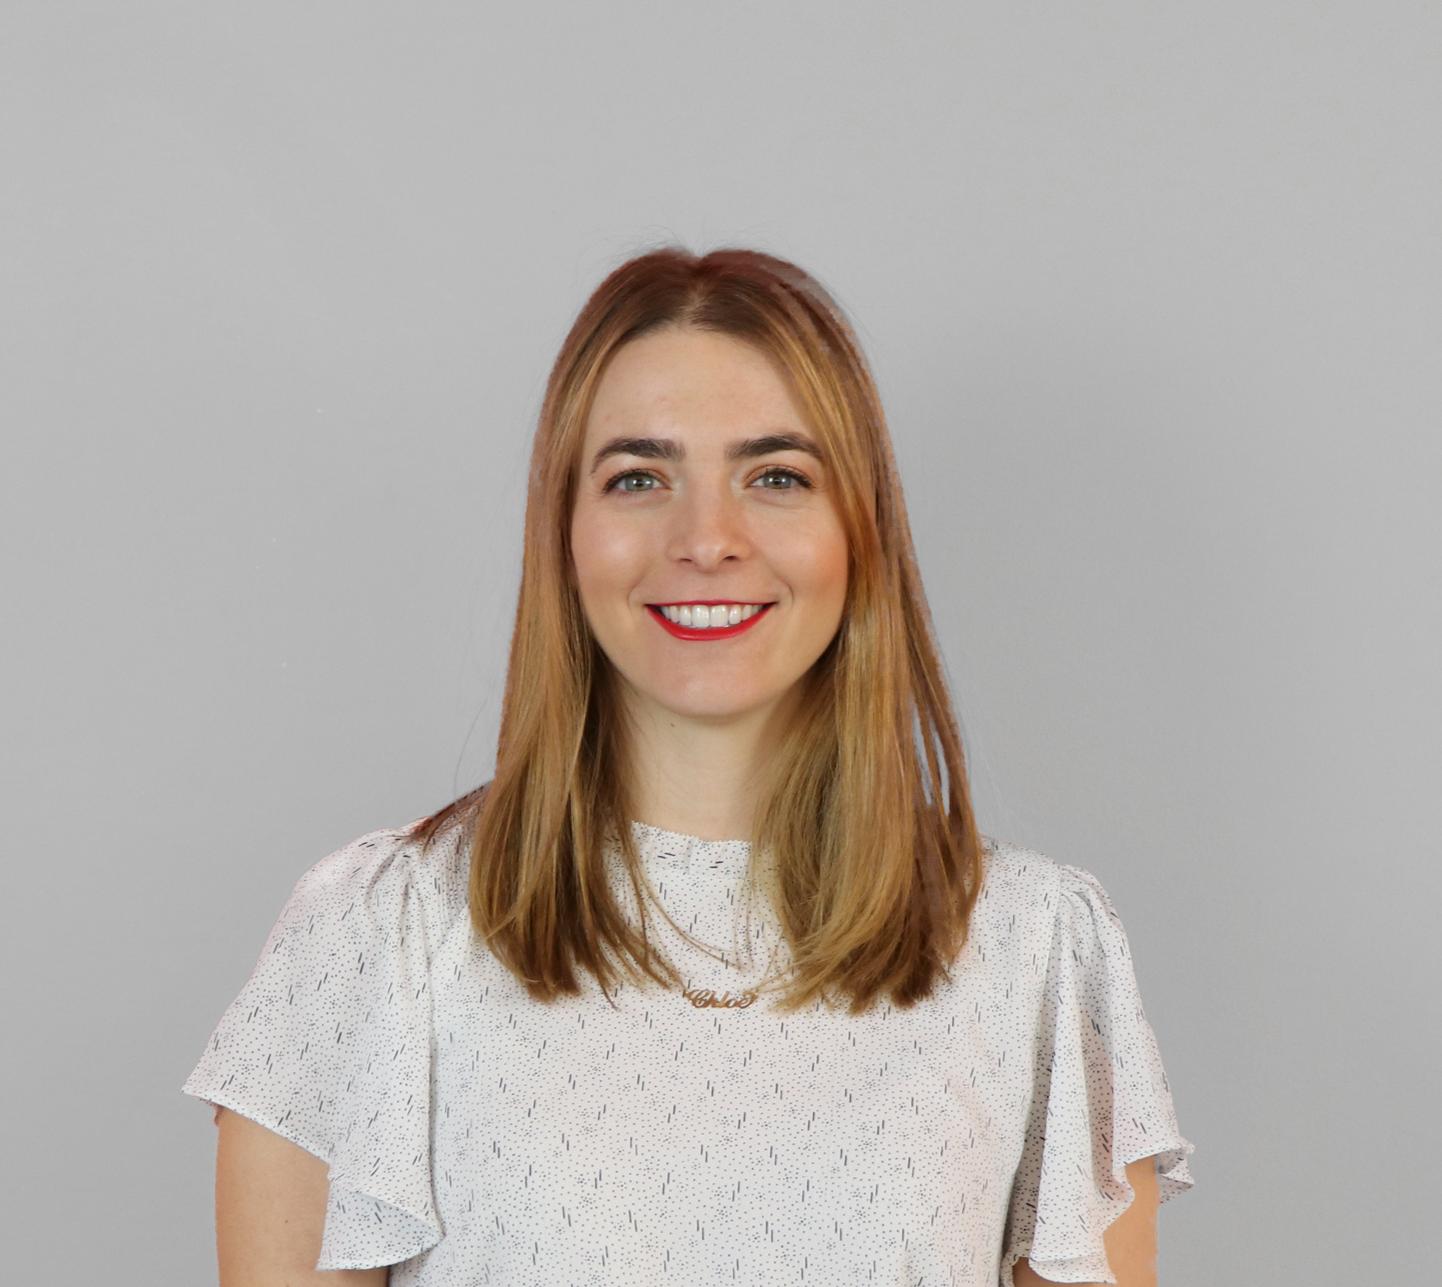 Chloe Wasserburger